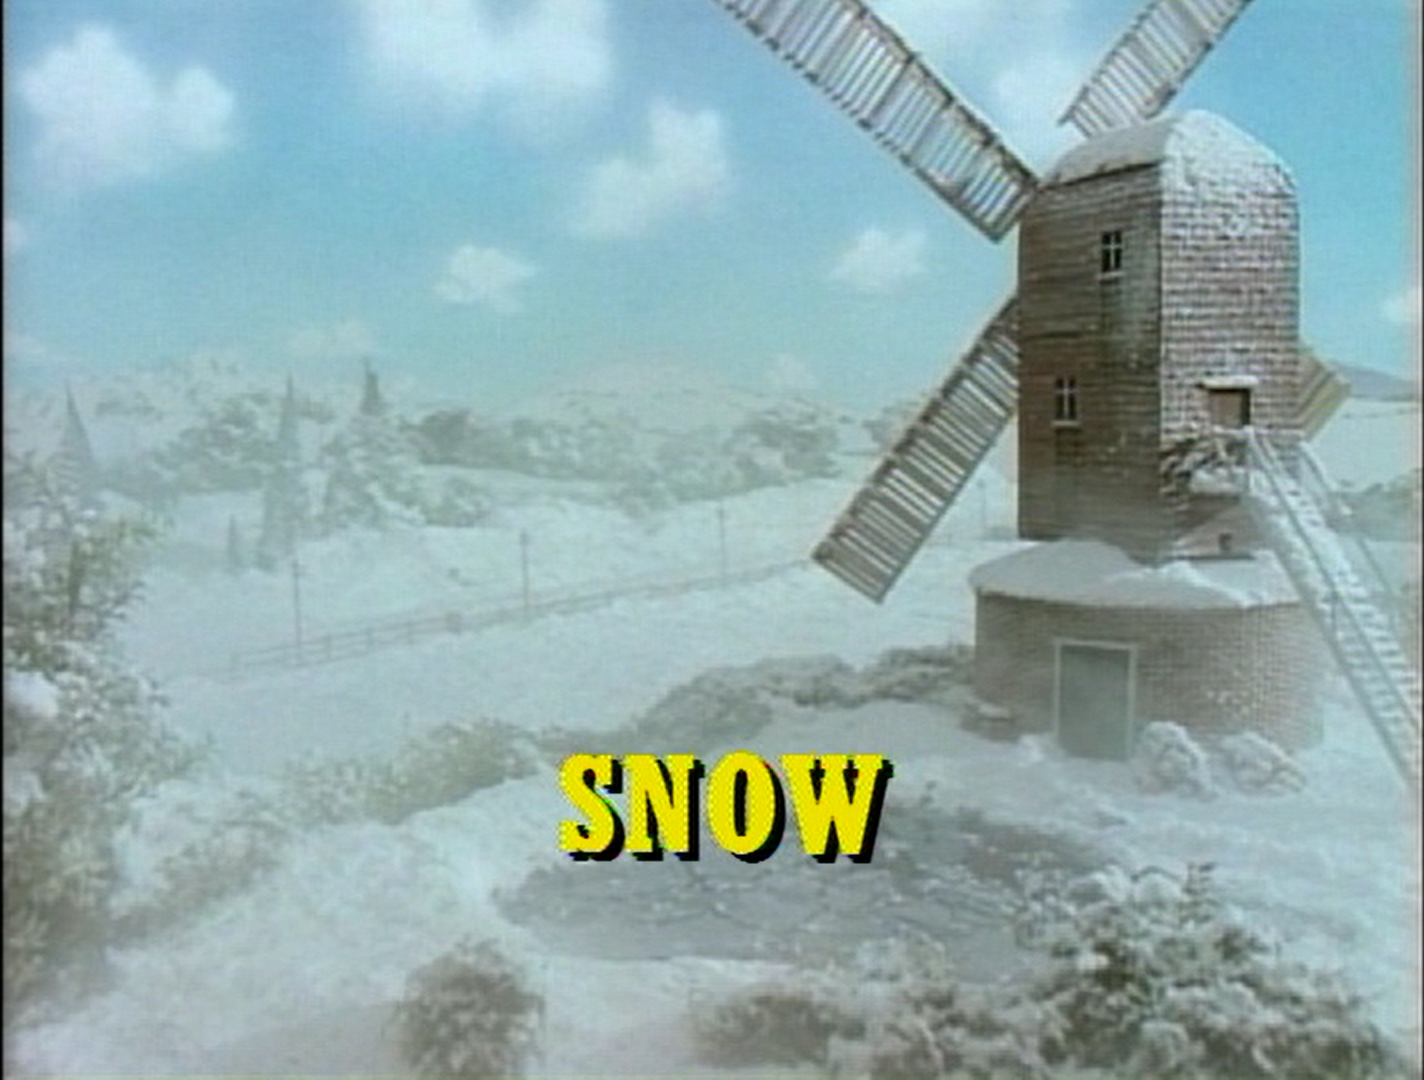 File:SnowUStitlecard.png